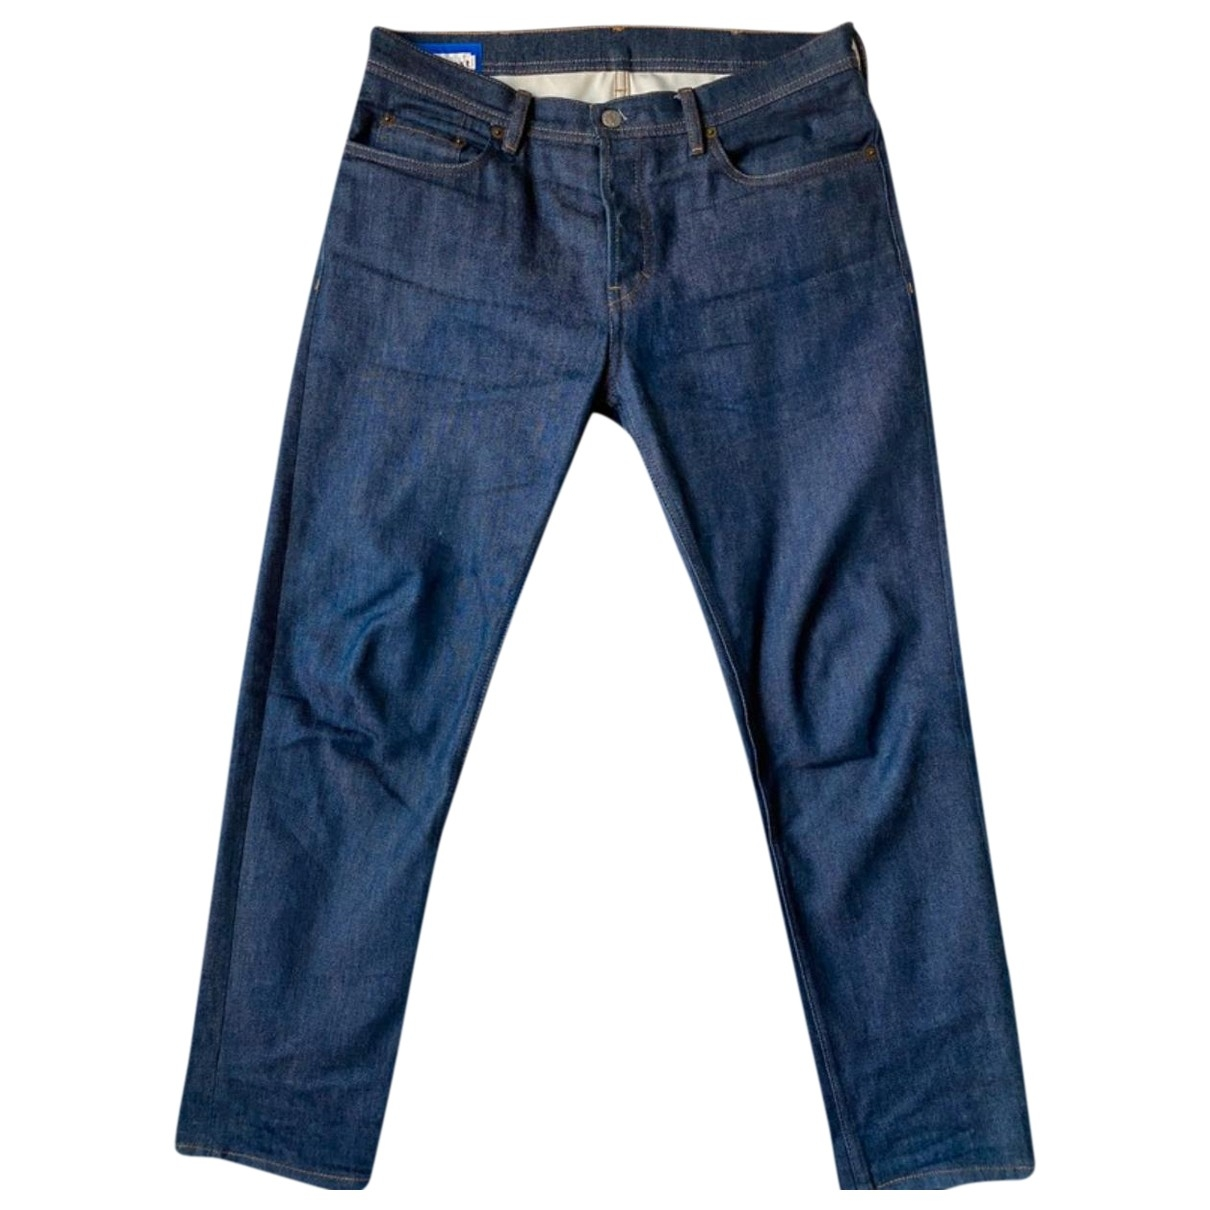 Acne Studios \N Blue Cotton - elasthane Jeans for Men 31 US